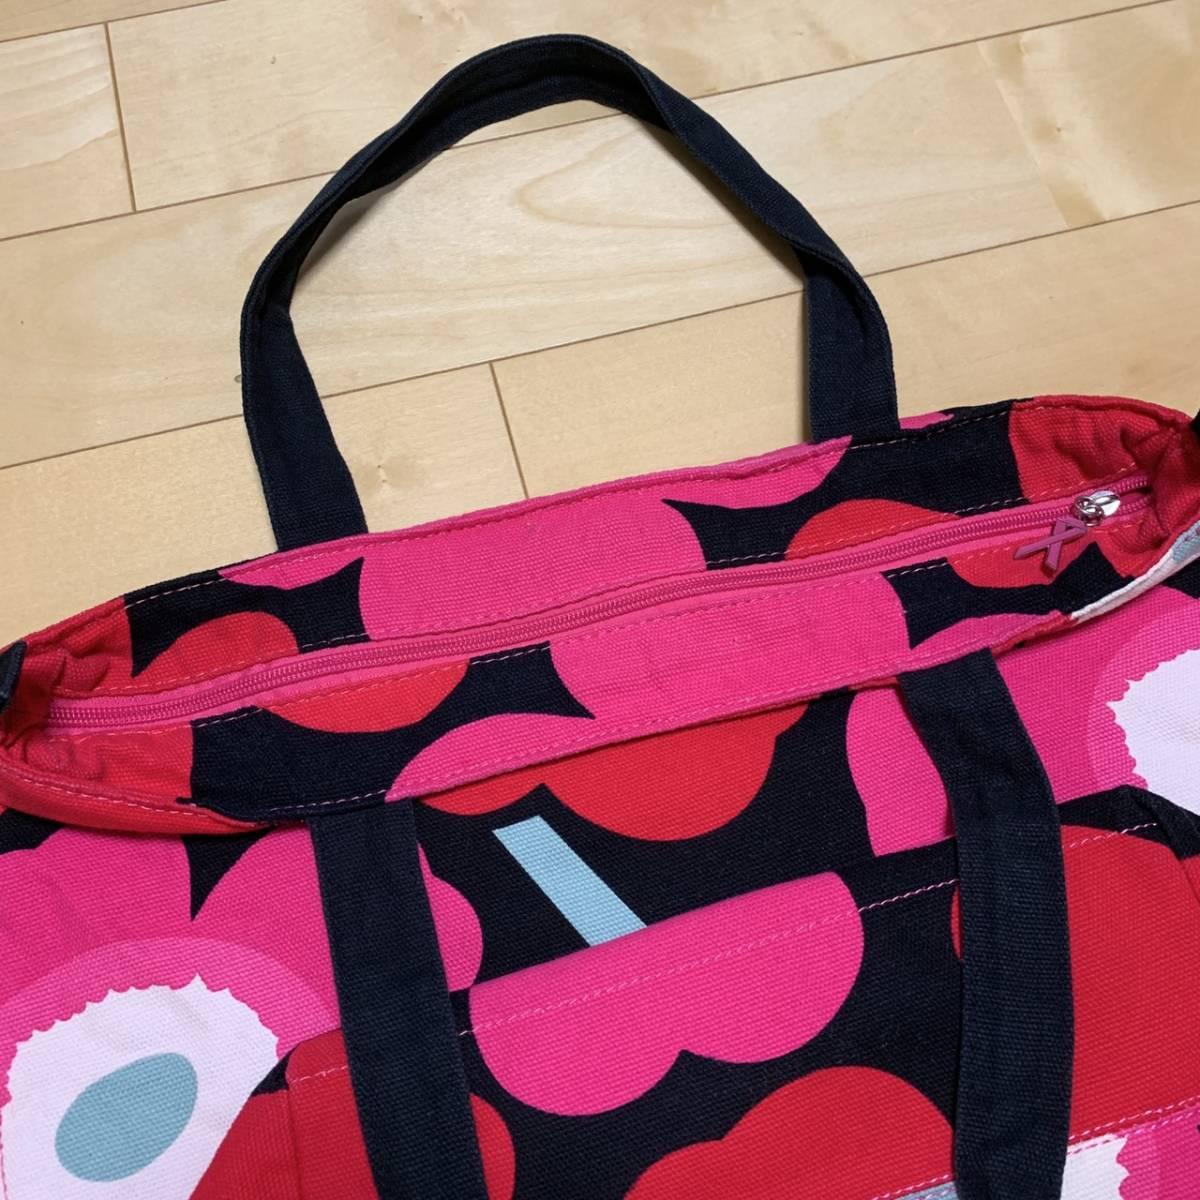 marimekko マリメッコ トートバッグ キャンバス 花柄 マザーズバッグ_画像4